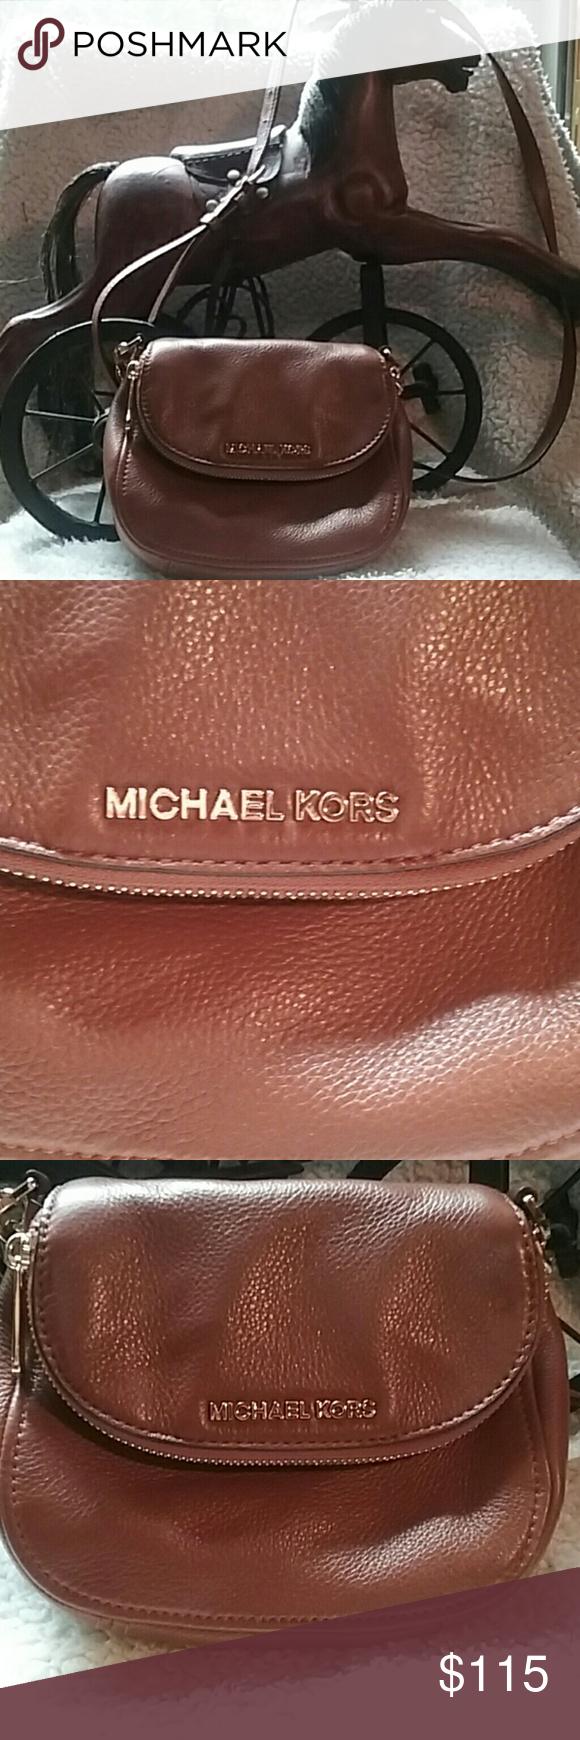 faa4b4c7d1bf Spotted while shopping on Poshmark  Michael kors cross body purse!  poshmark   fashion  shopping  style  Michael Kors  Handbags